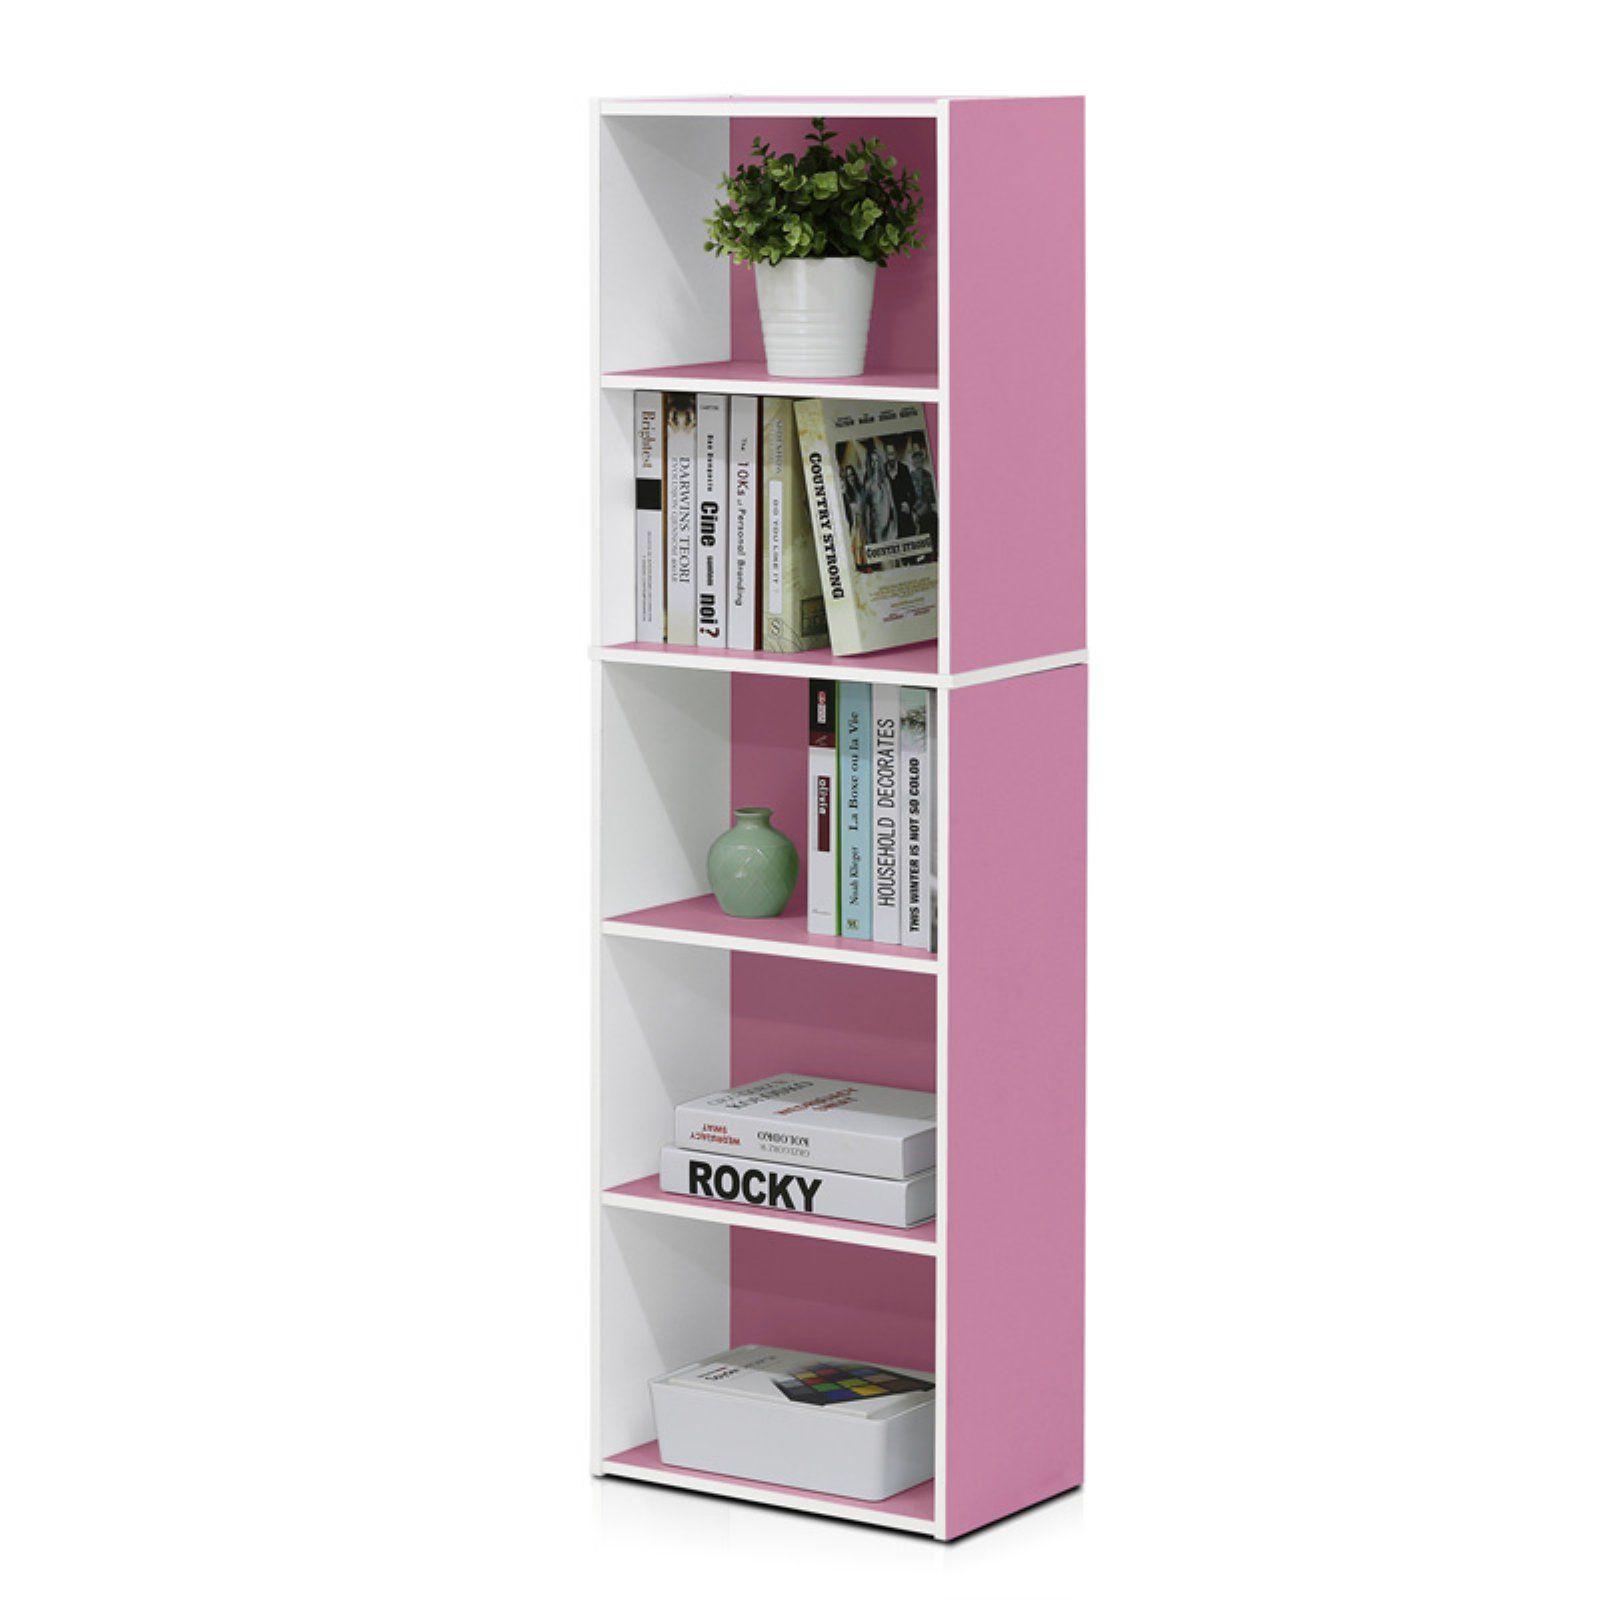 Furinno Bookcase Open Shelf 5 Tier Reversible Display Storage Decor Kids Room